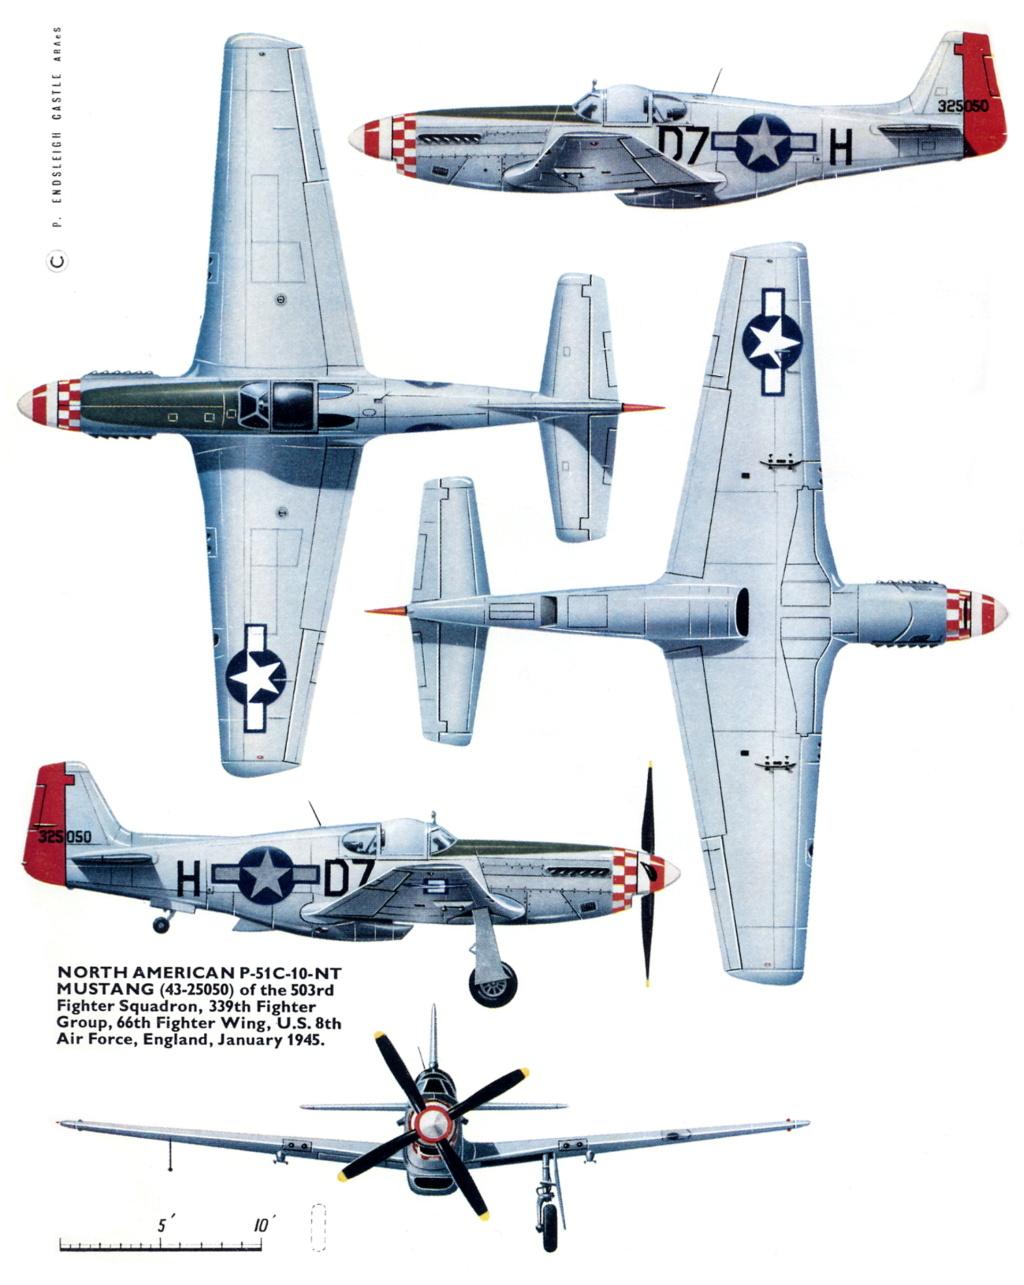 NORTH AMERICAN P-51 MUSTANG P-51b-10